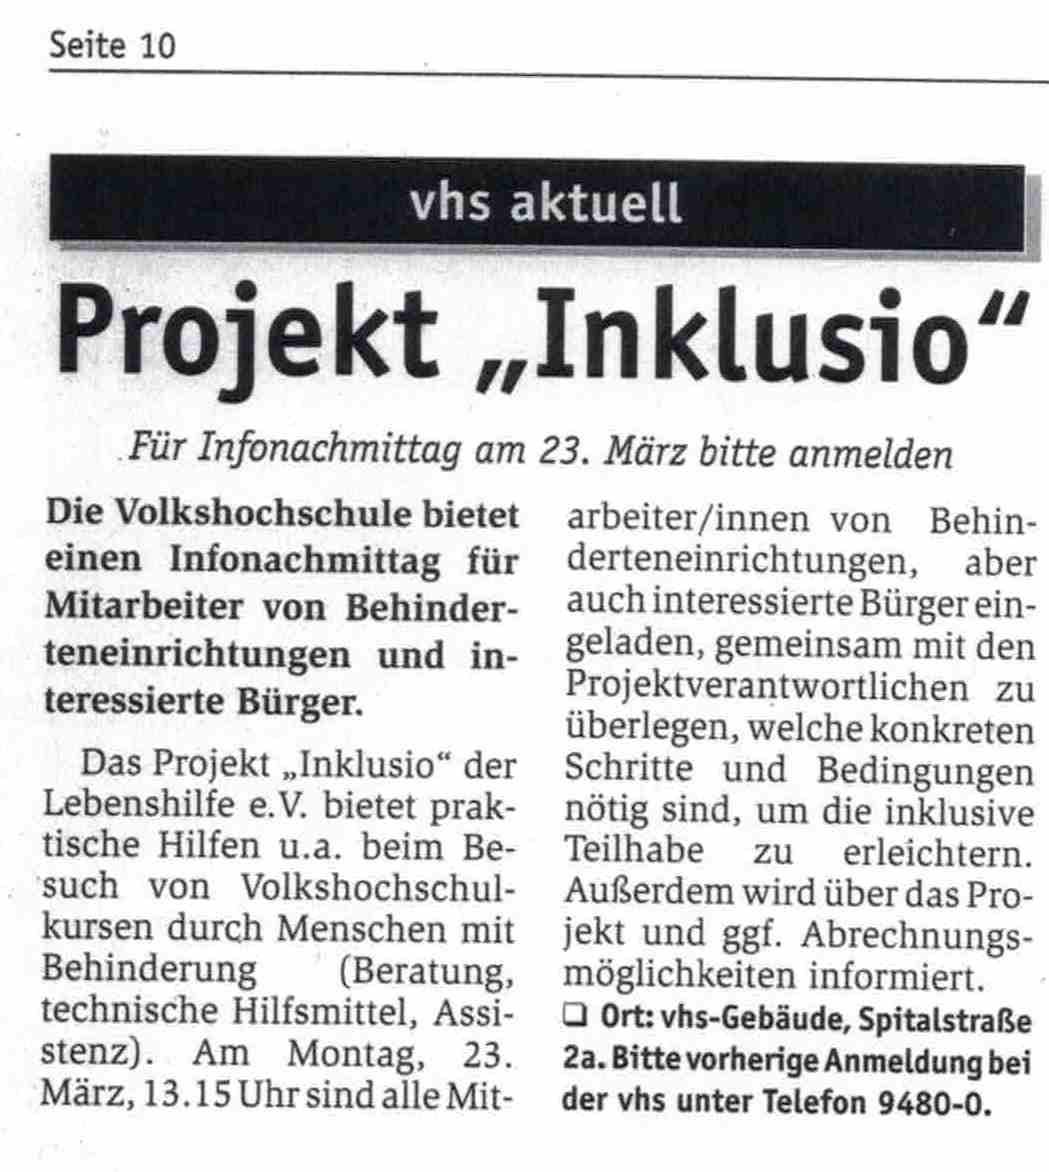 Stadtblatt 2015-3.3.jpg - 82.58 KB